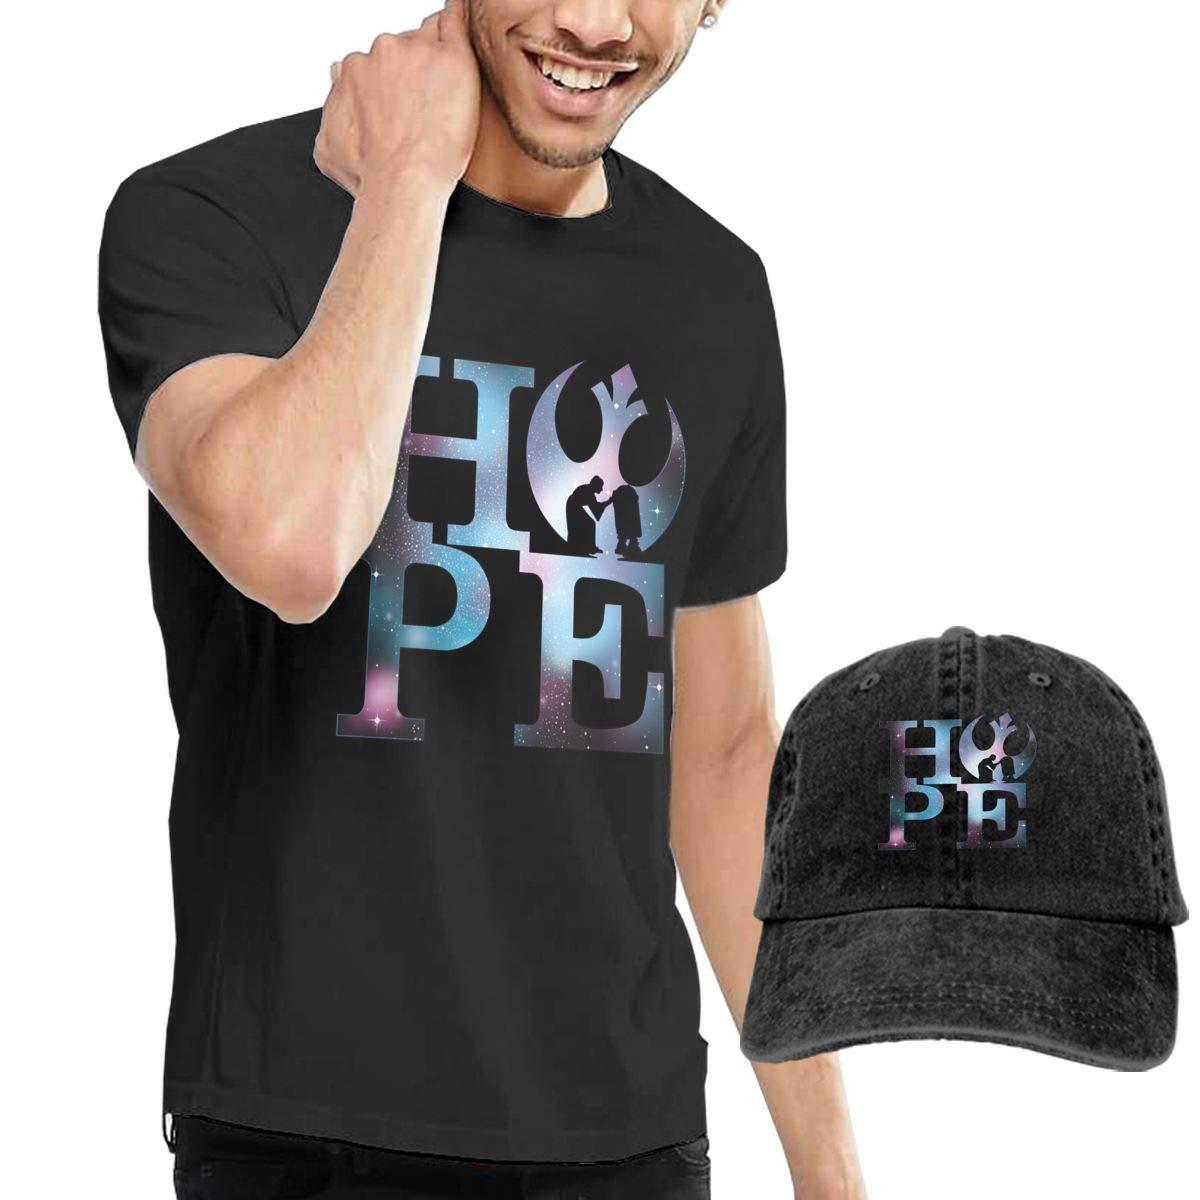 Yiooeea Mens Hope T Shirts and Washed Denim Baseball Dad Hat Black L